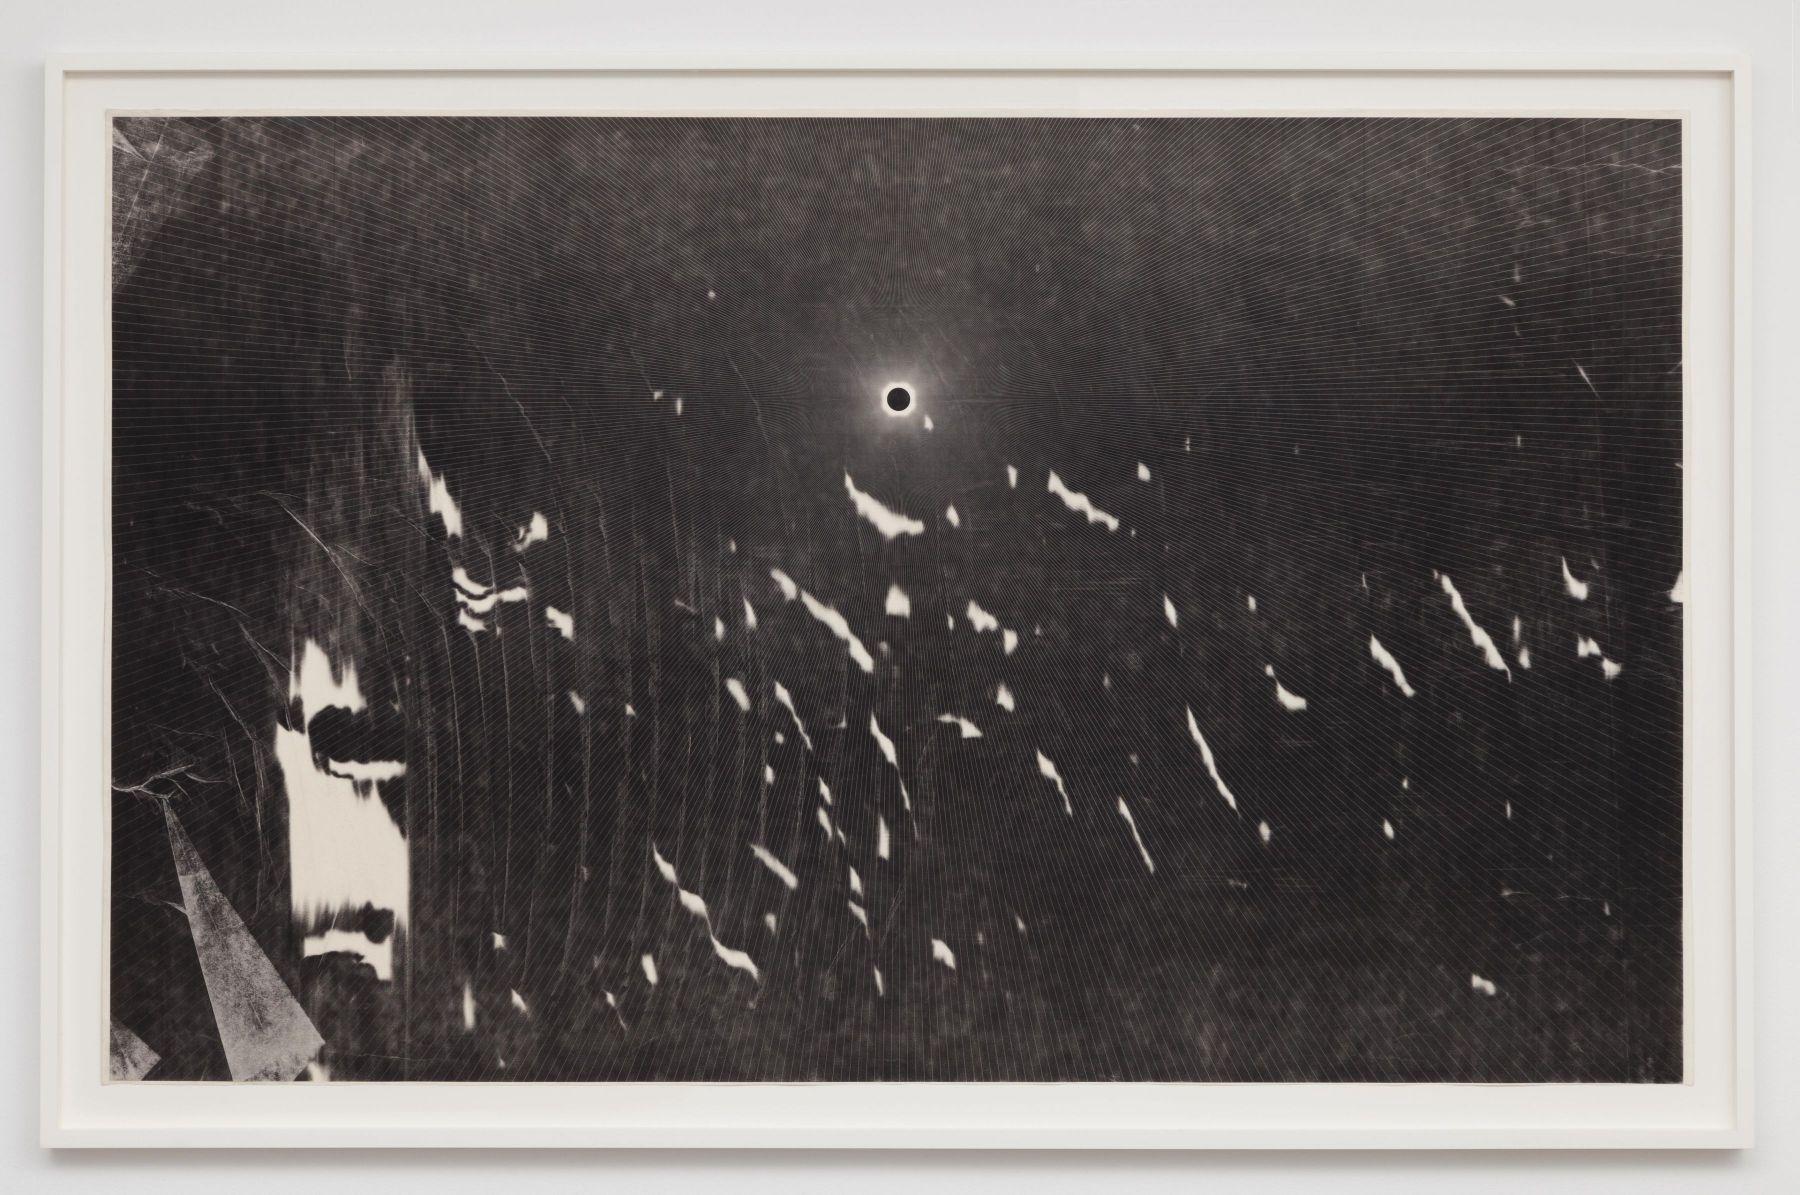 Marsha Cottrell, Untitled